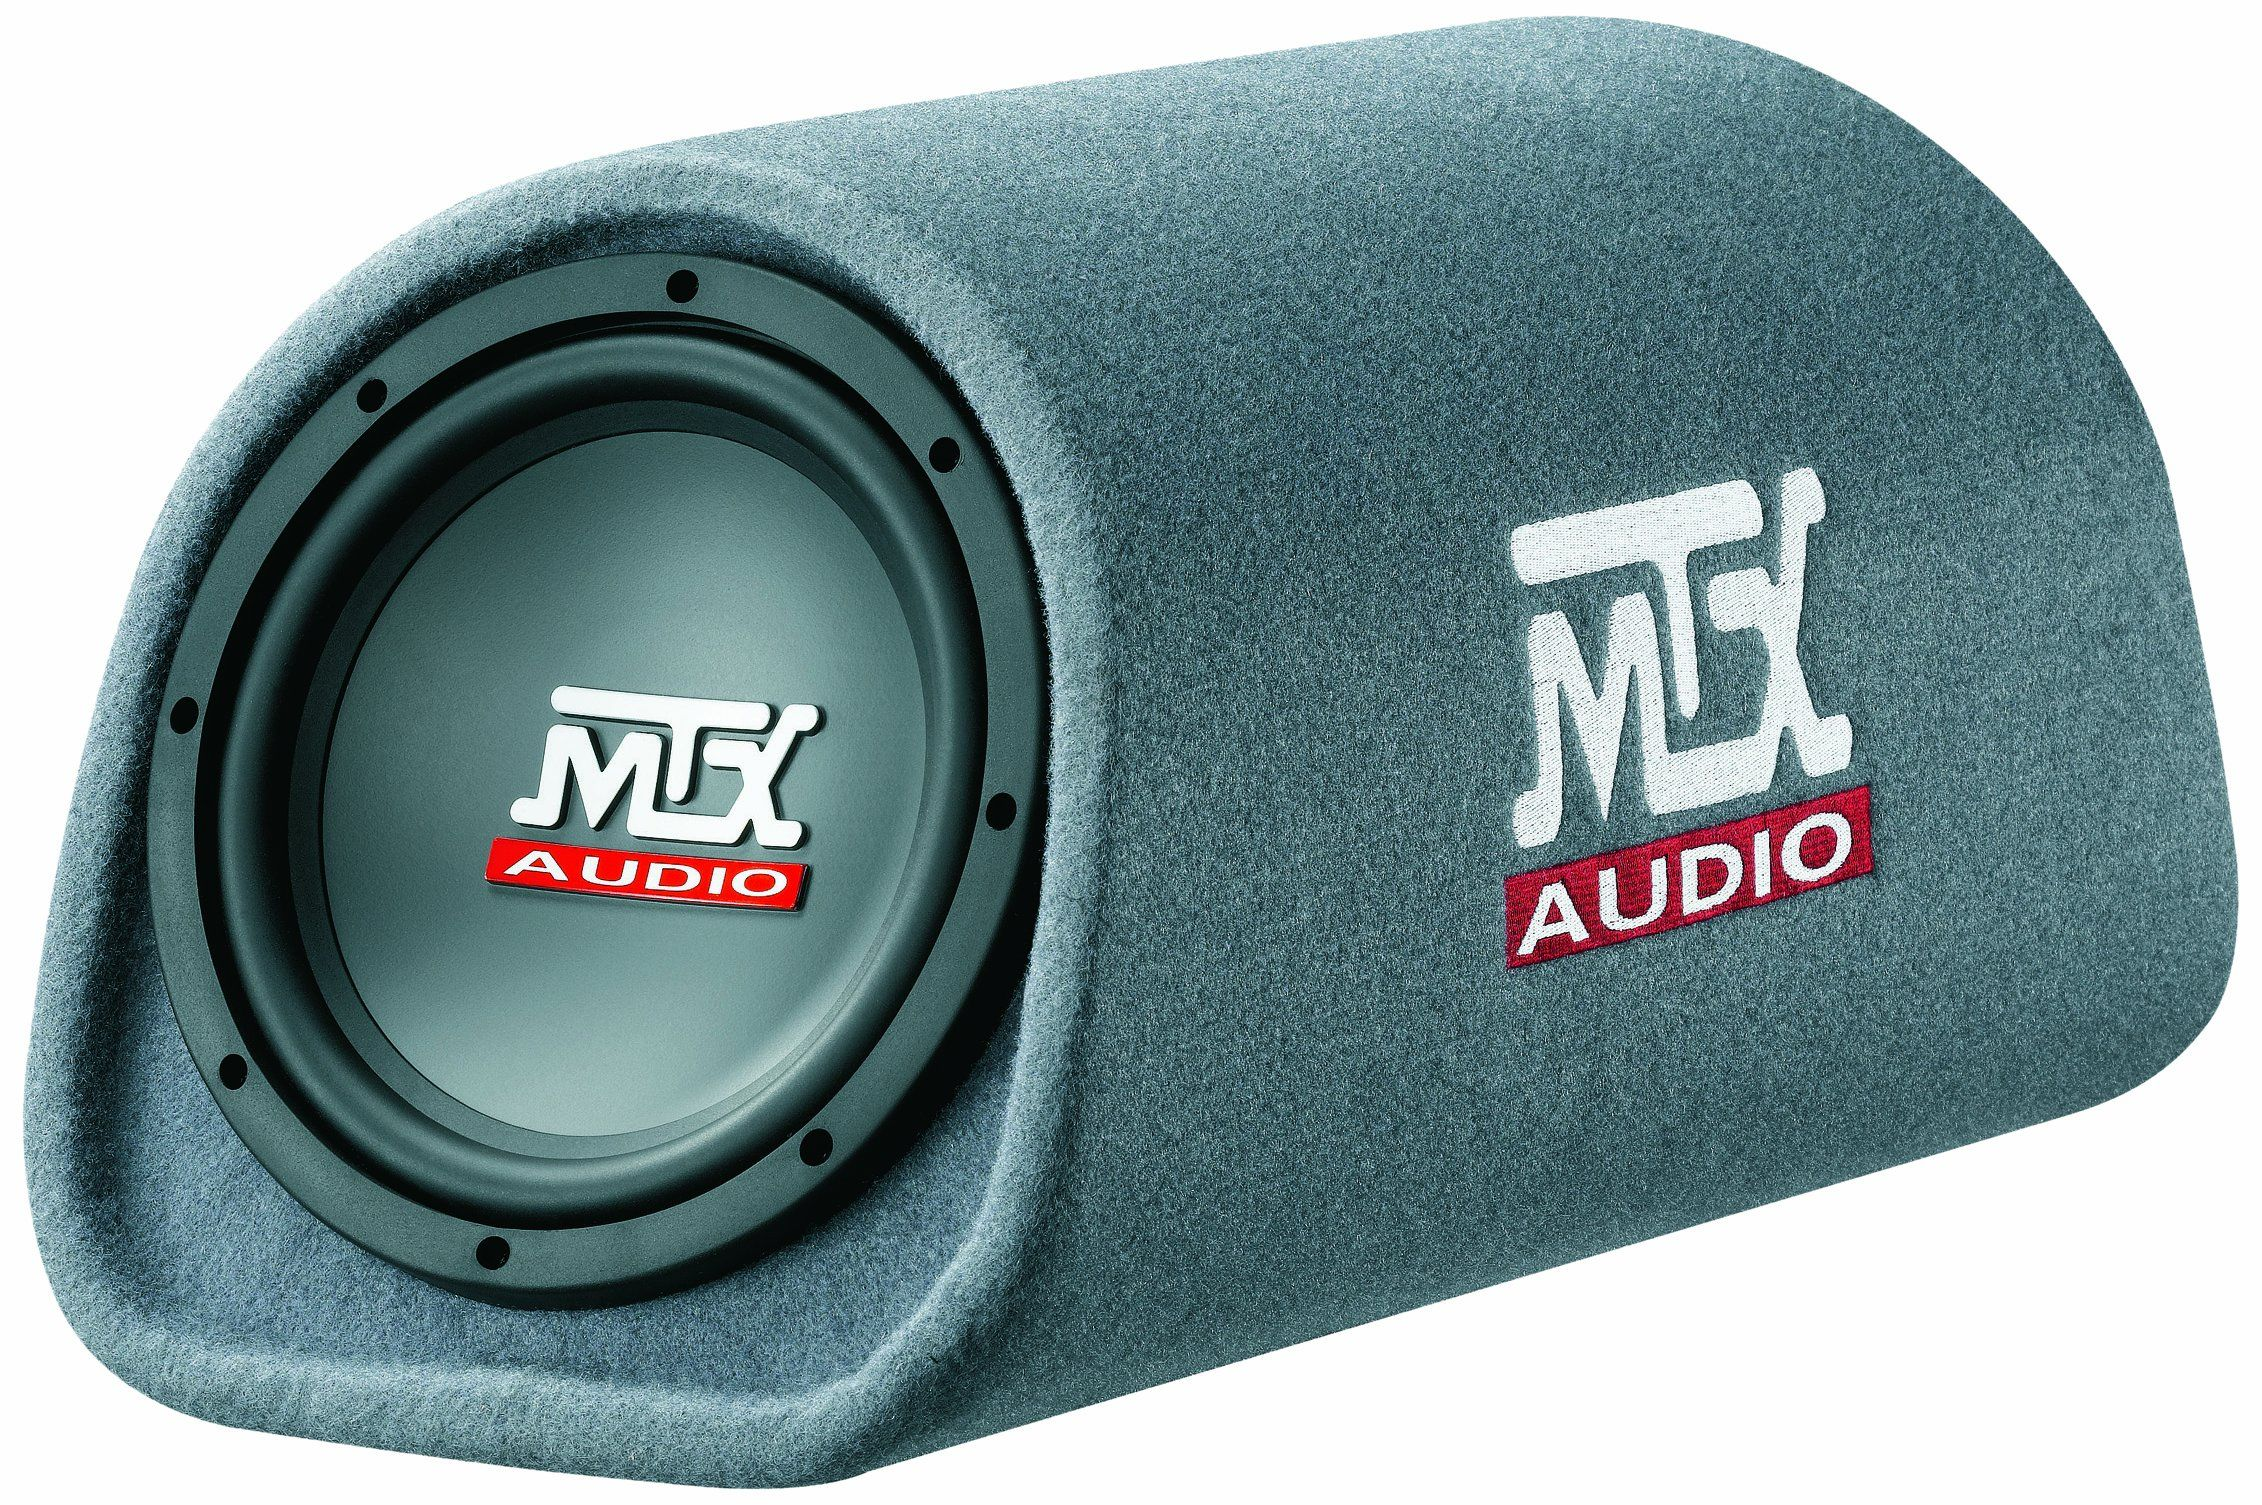 mtx audio rt8pt universal powered subwoofer enclosure amplifier Mtx Thunder 6000 Wiring Diagram mtx audio rt8pt universal powered subwoofer enclosure amplifier power output 120 watts rms mtx thunder 6000 wiring diagram